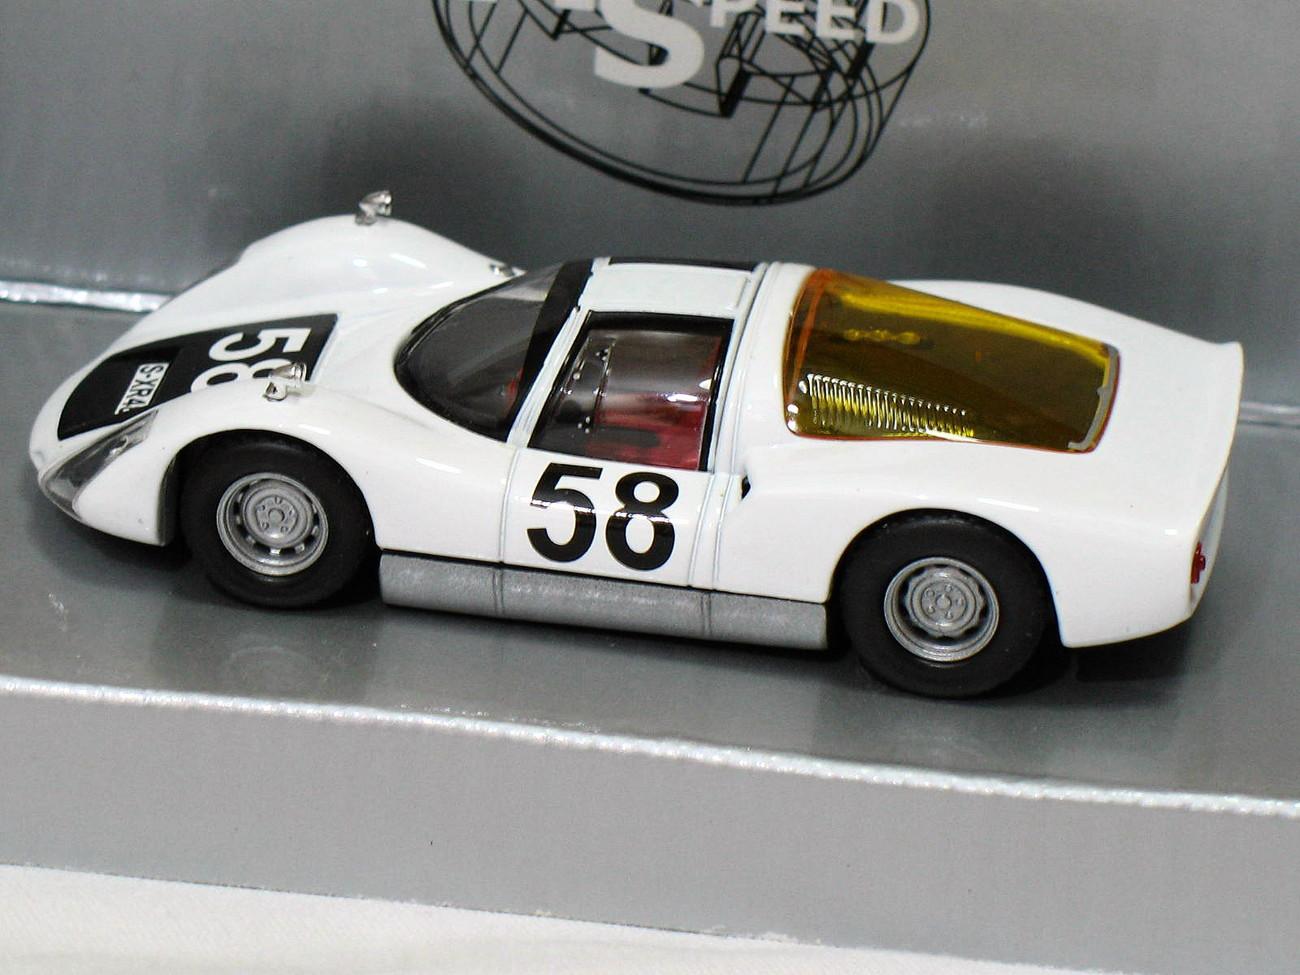 Porsche 906 Carrera 6 #58 1965 white 1/43 die cast model car (Rare)